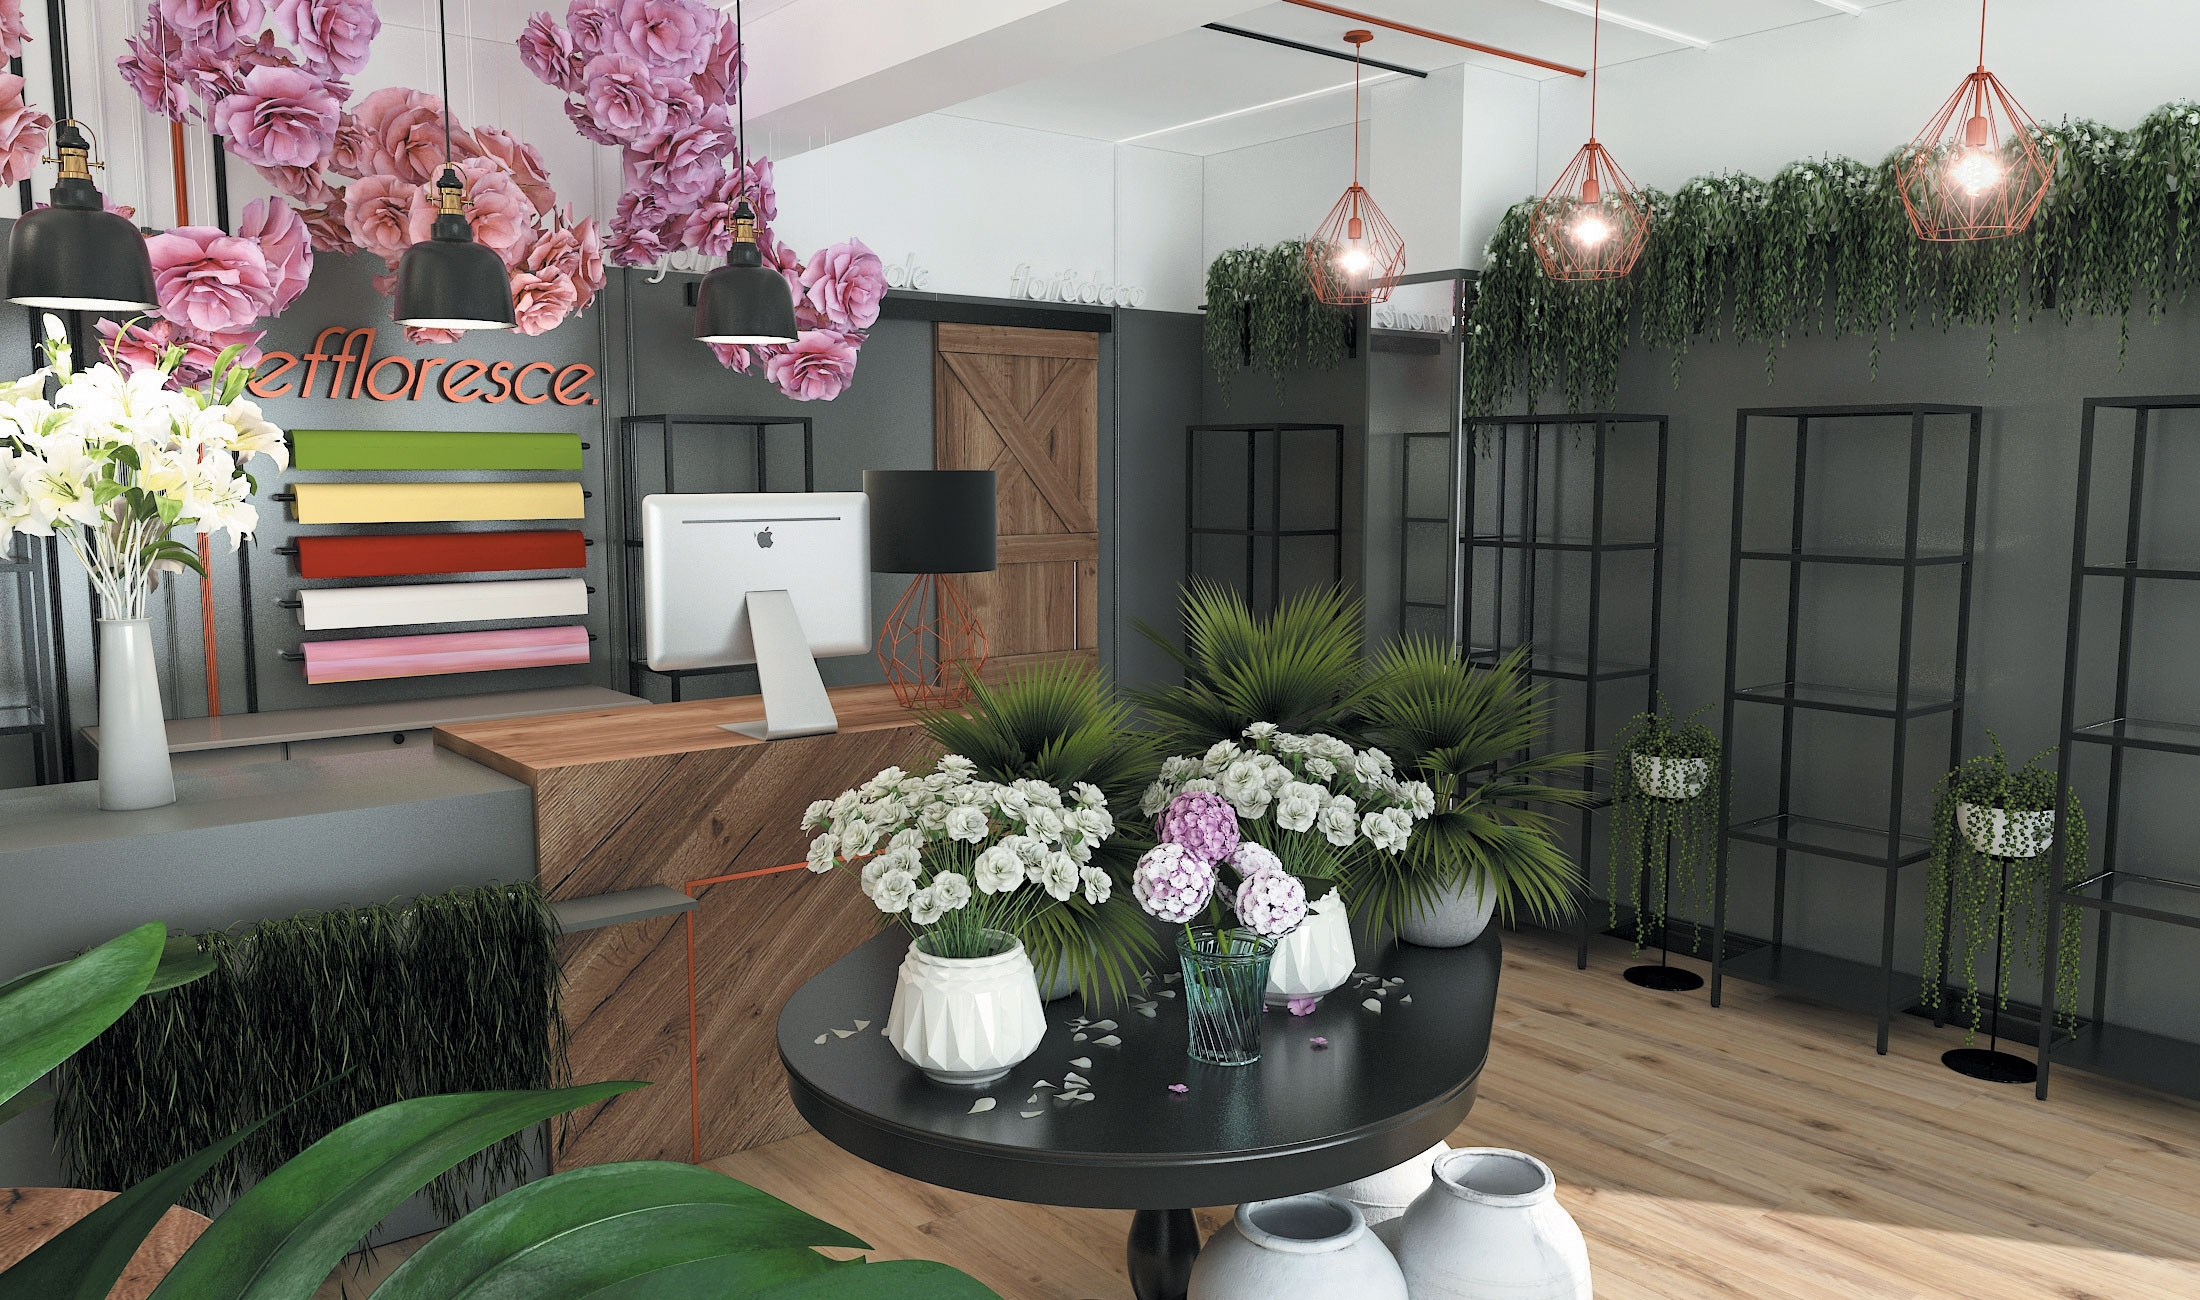 design interior effloresce randare